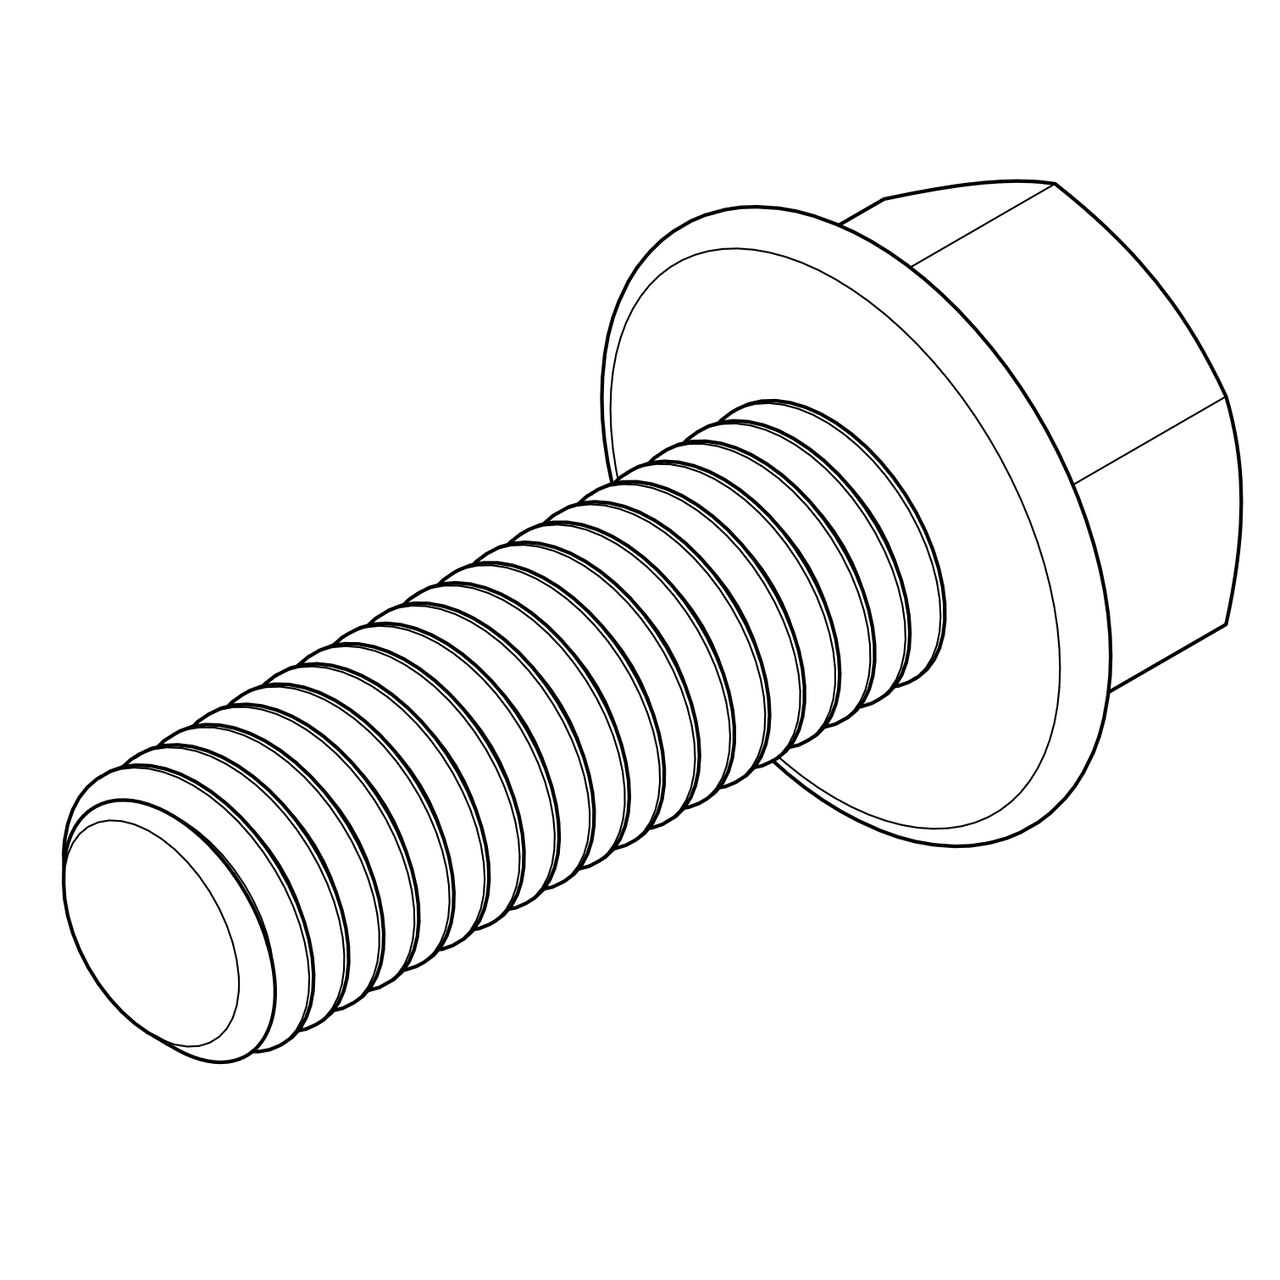 B8F12NC112 (783514)